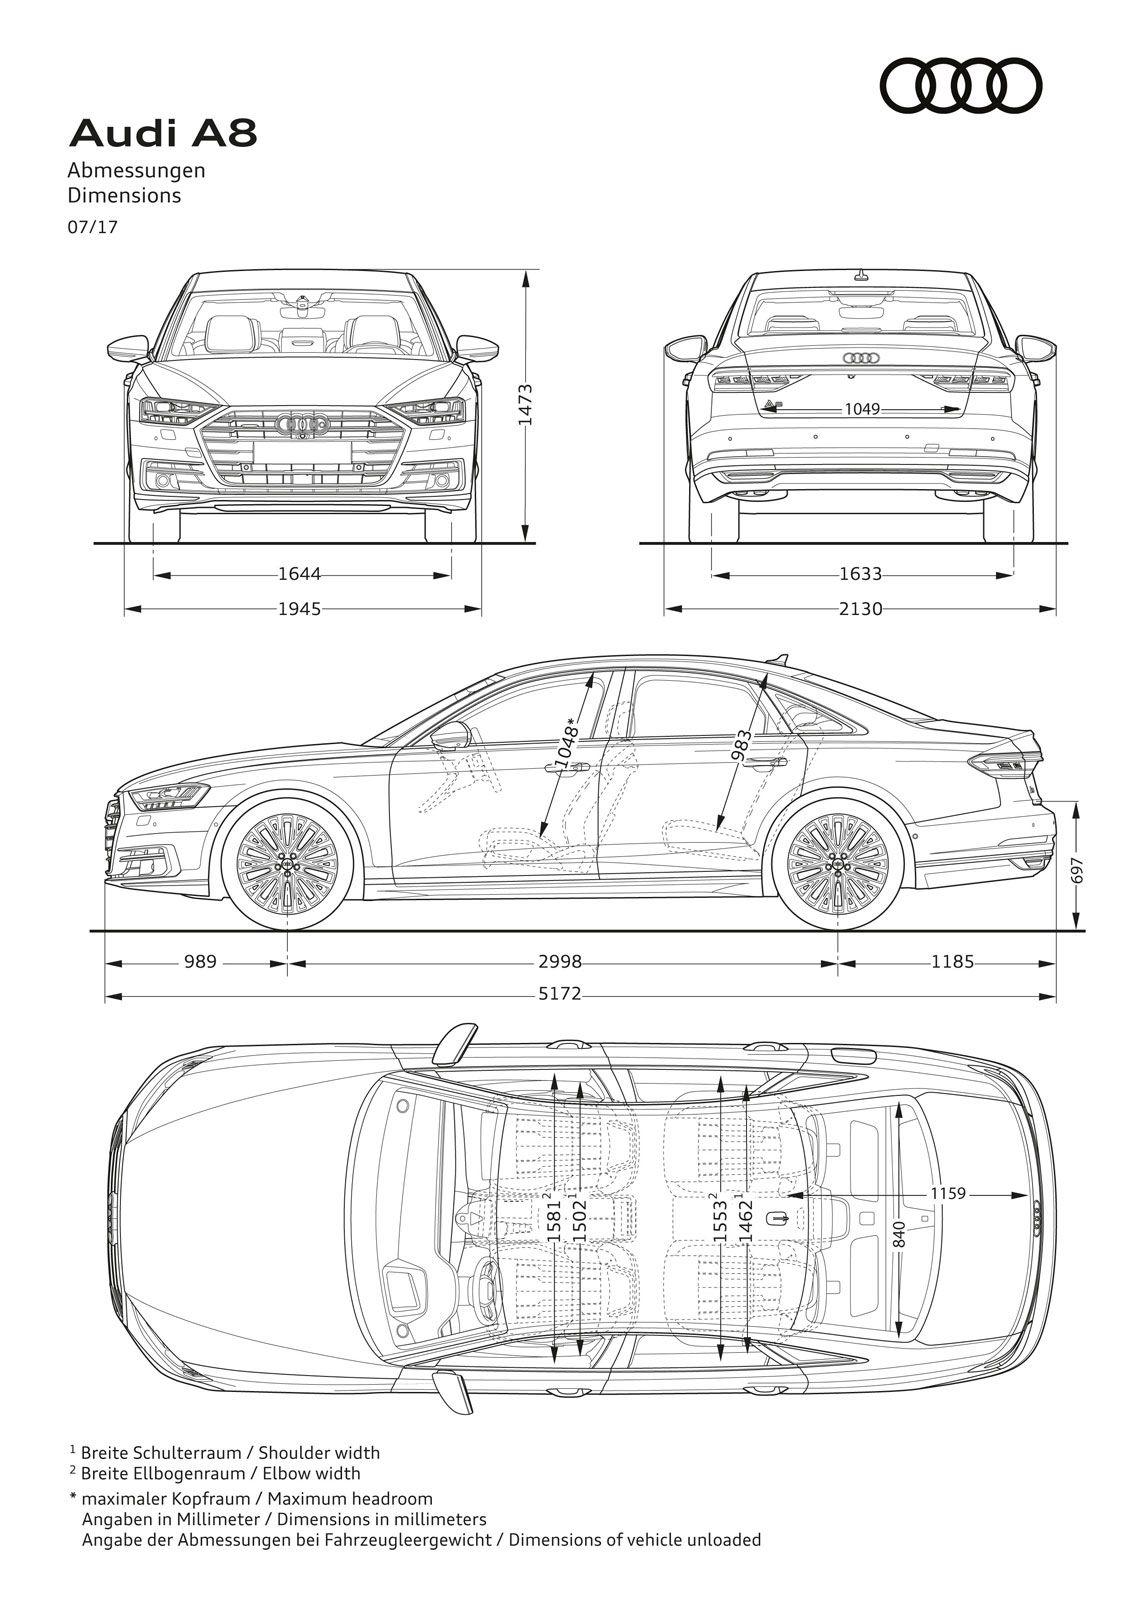 Audi A8 Dimensions Blueprint